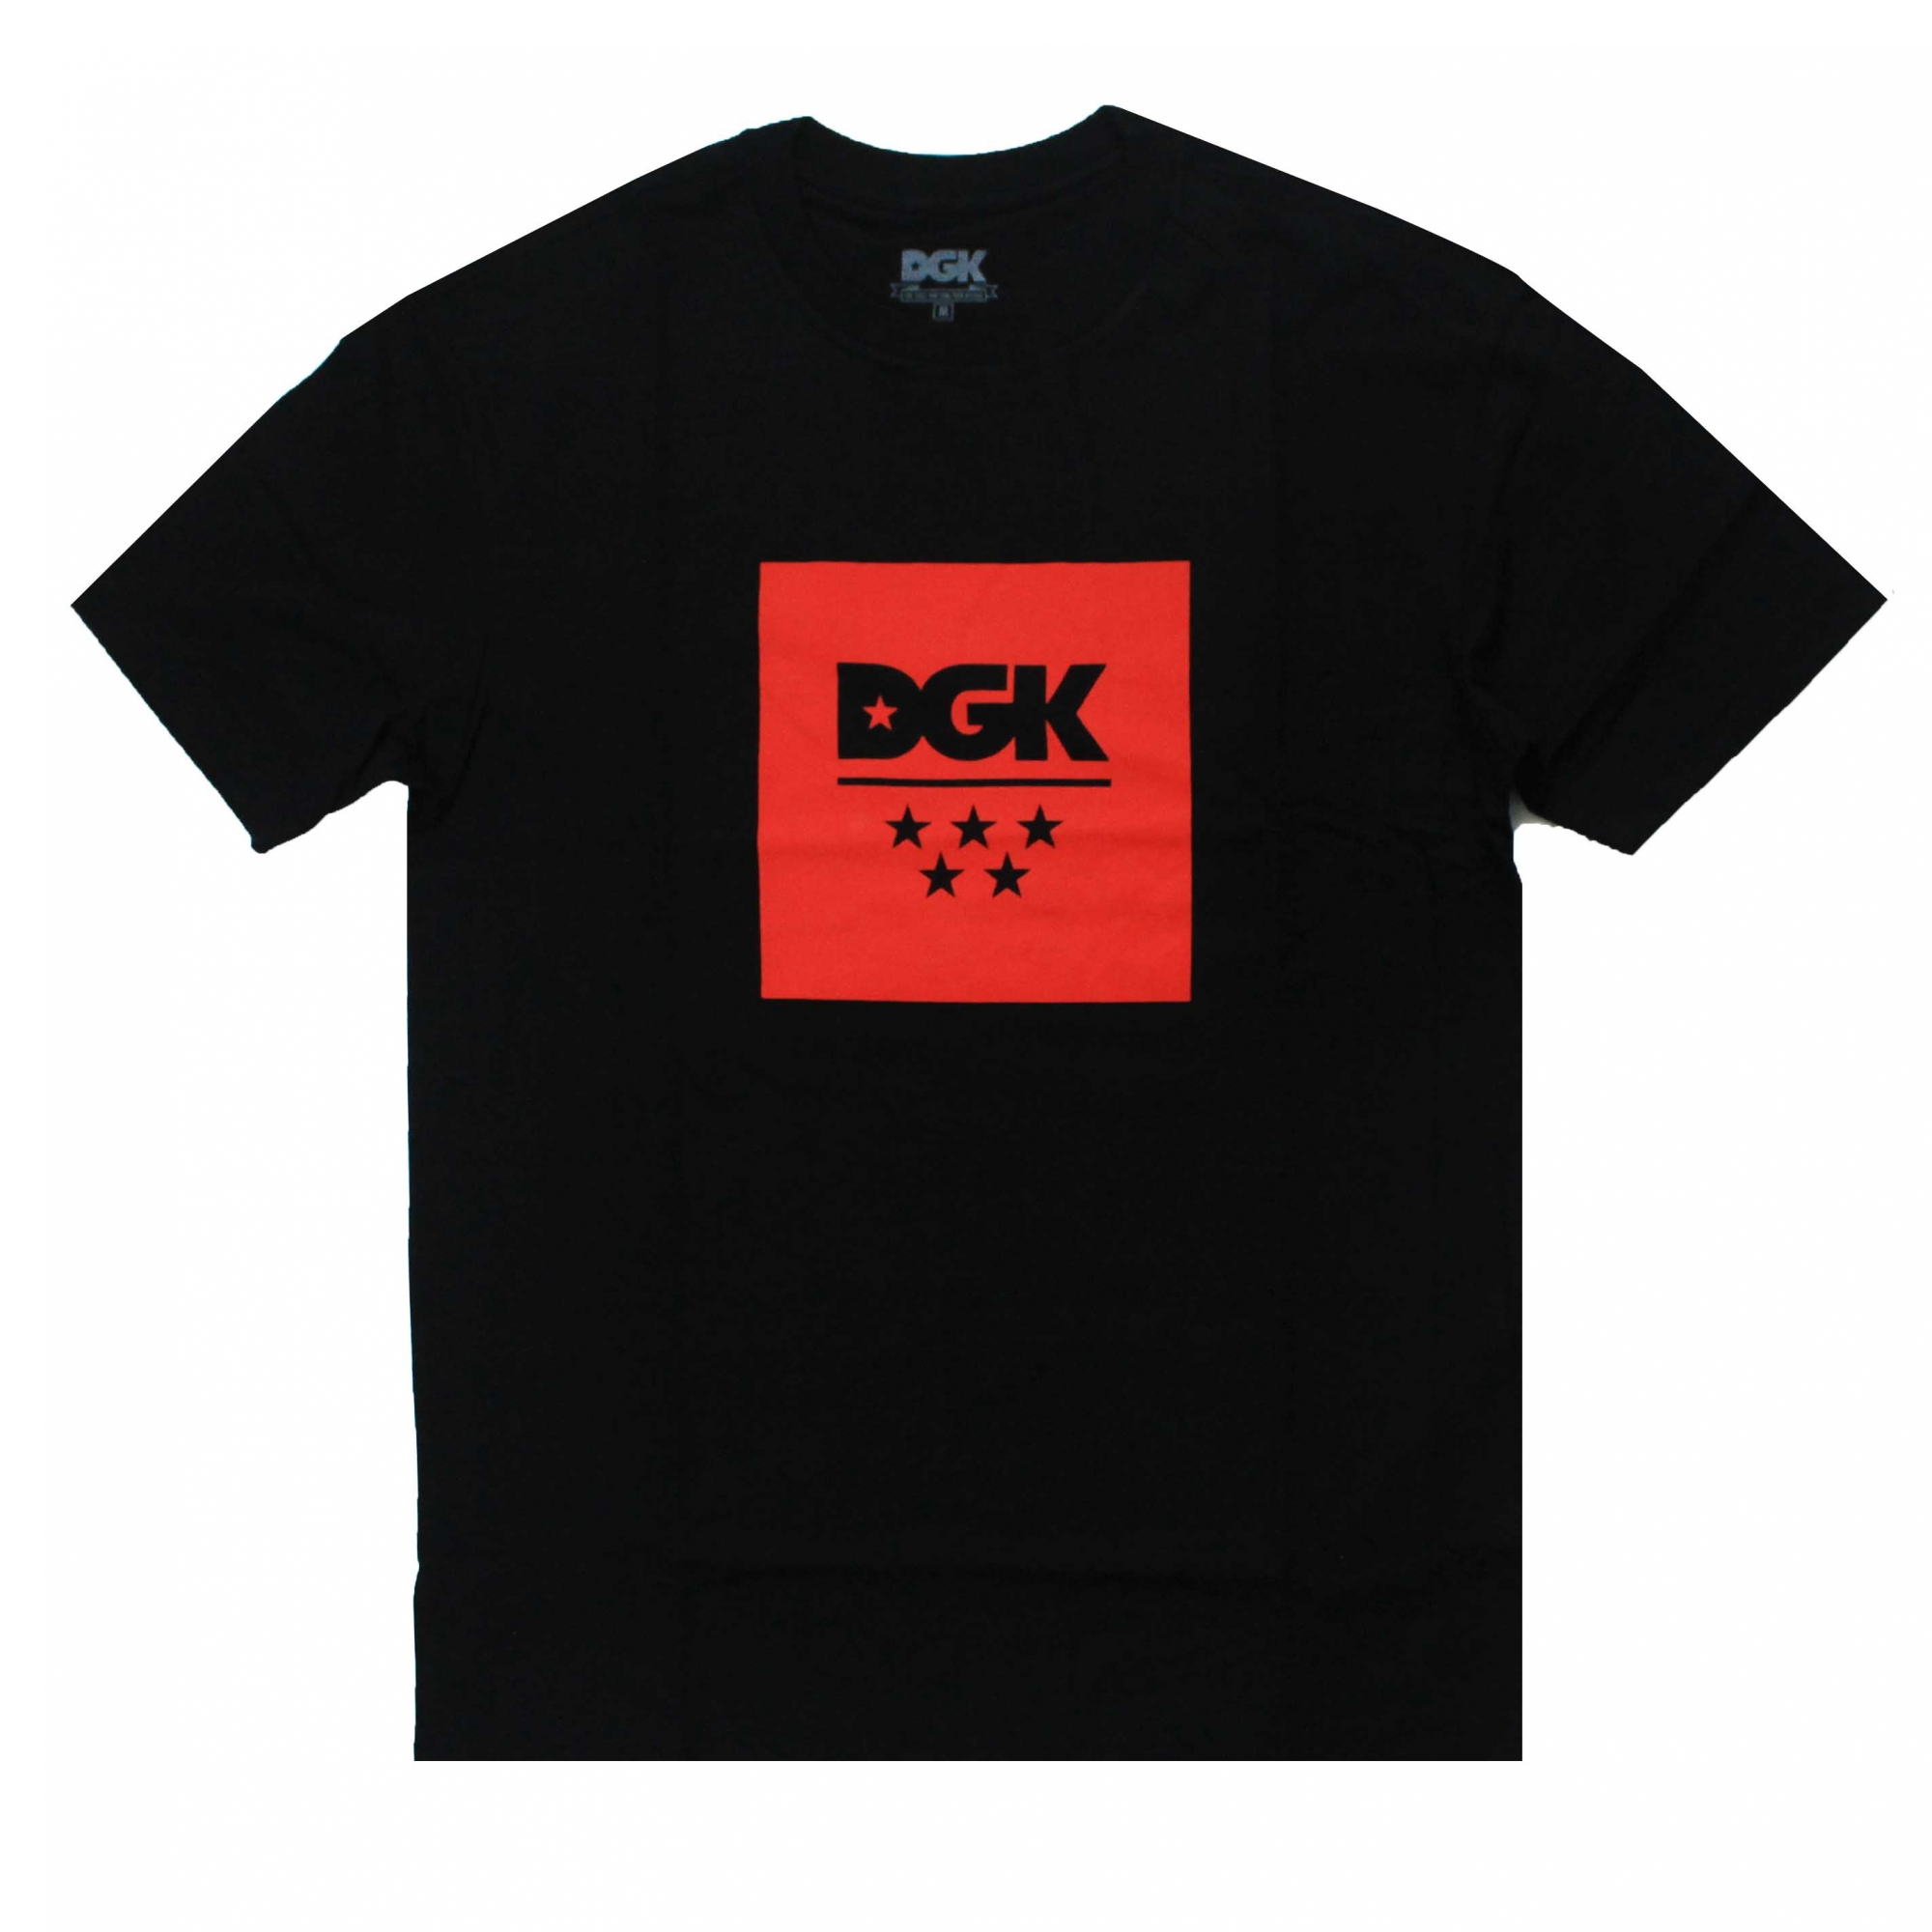 Camiseta DGK New All Star - Preto/Vermelho